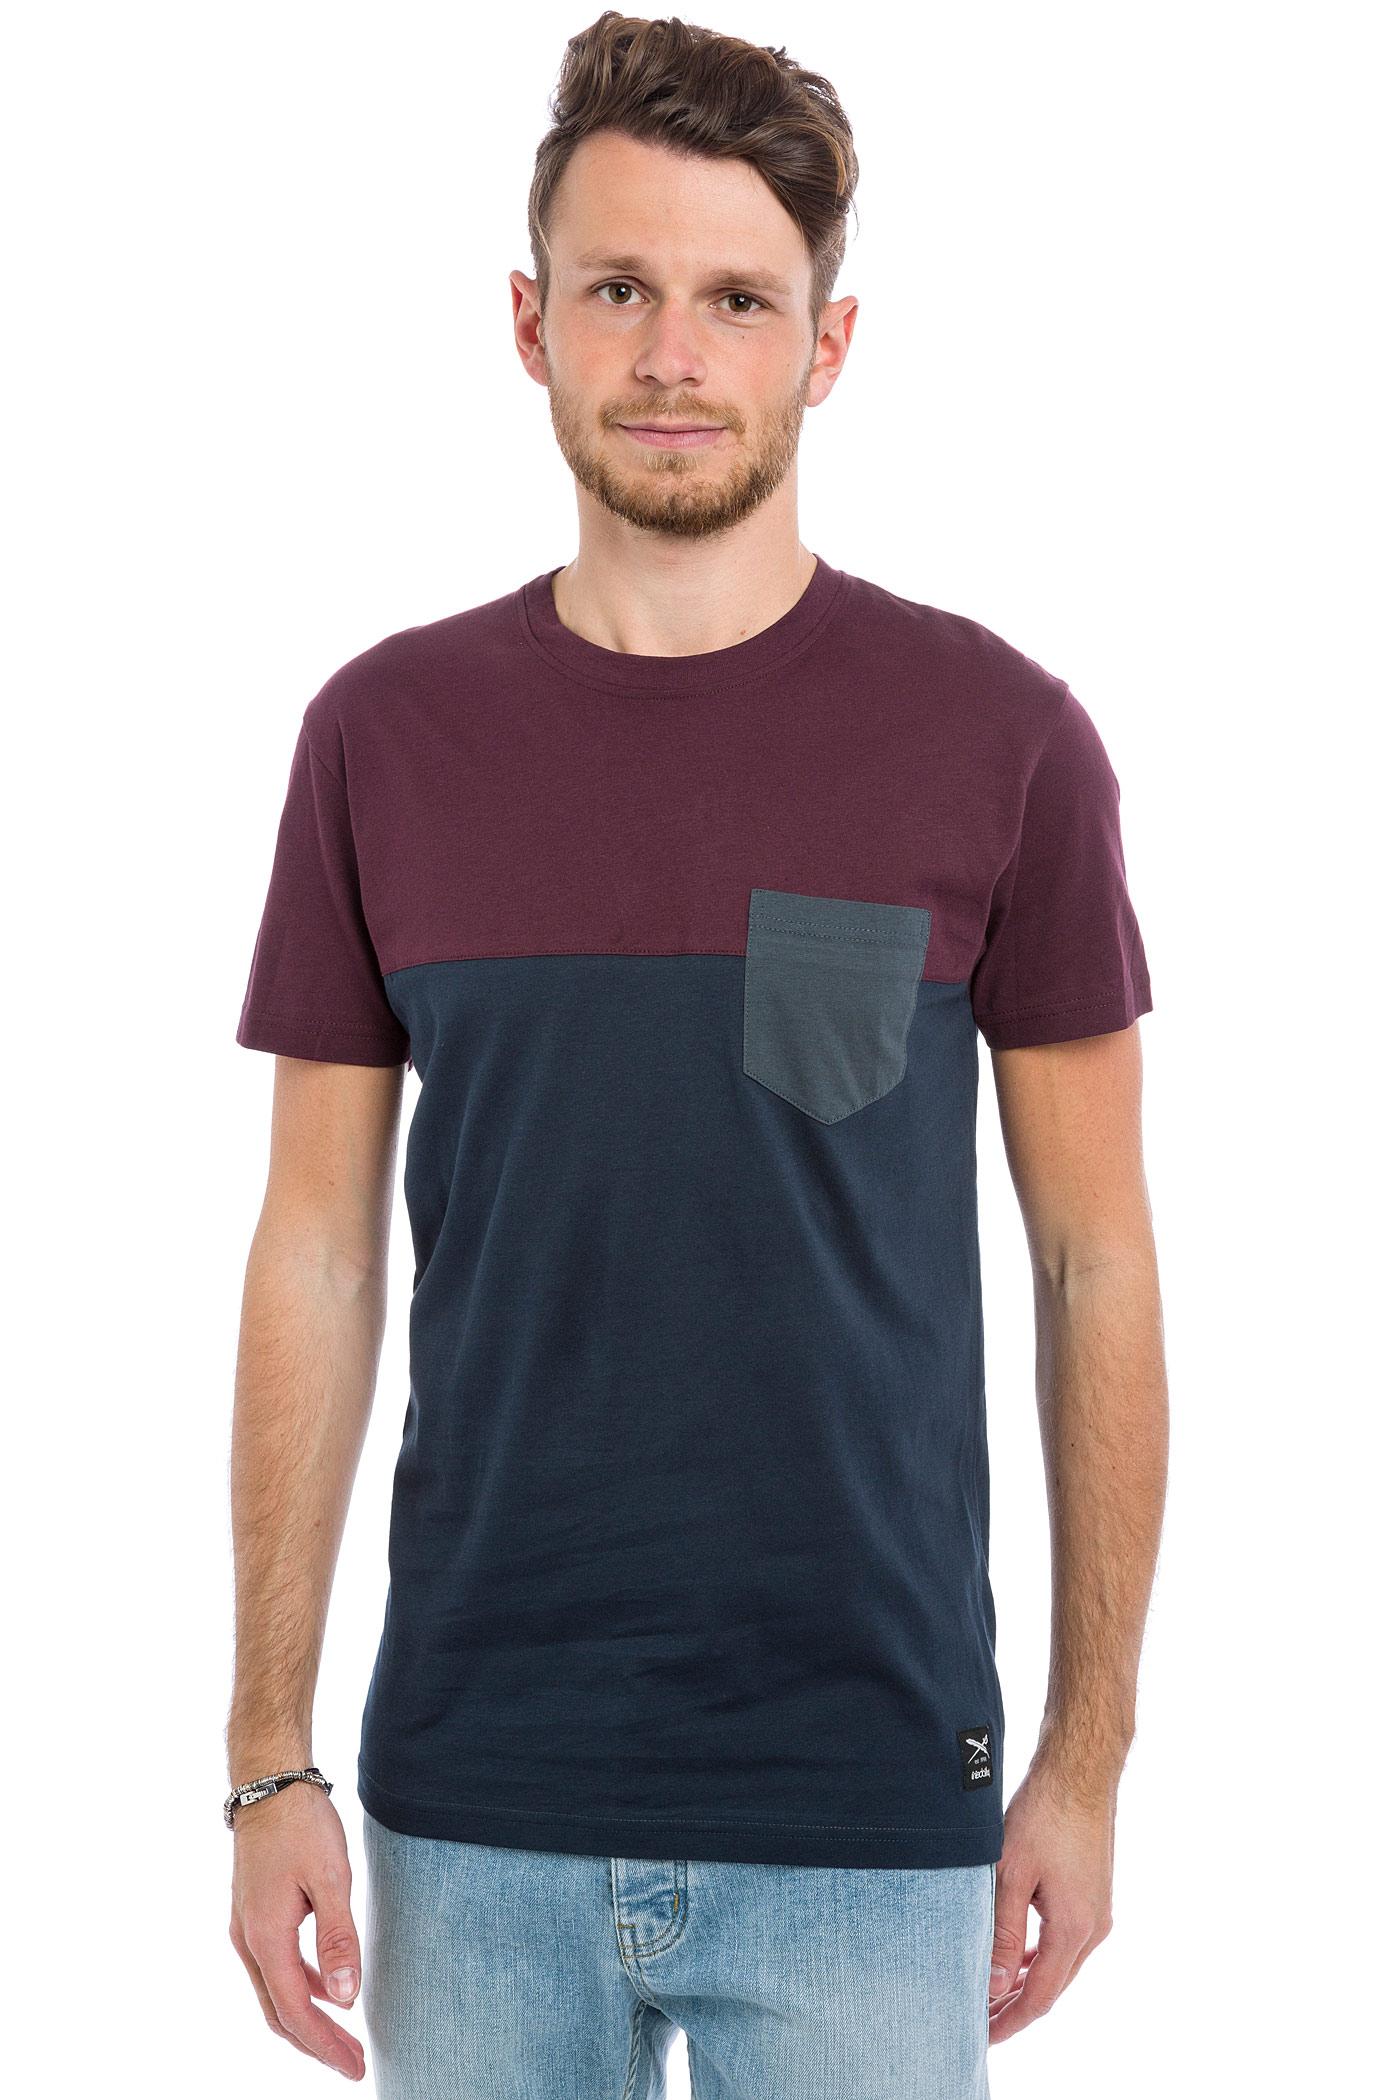 iriedaily block pocket t shirt navy wine buy at skatedeluxe. Black Bedroom Furniture Sets. Home Design Ideas